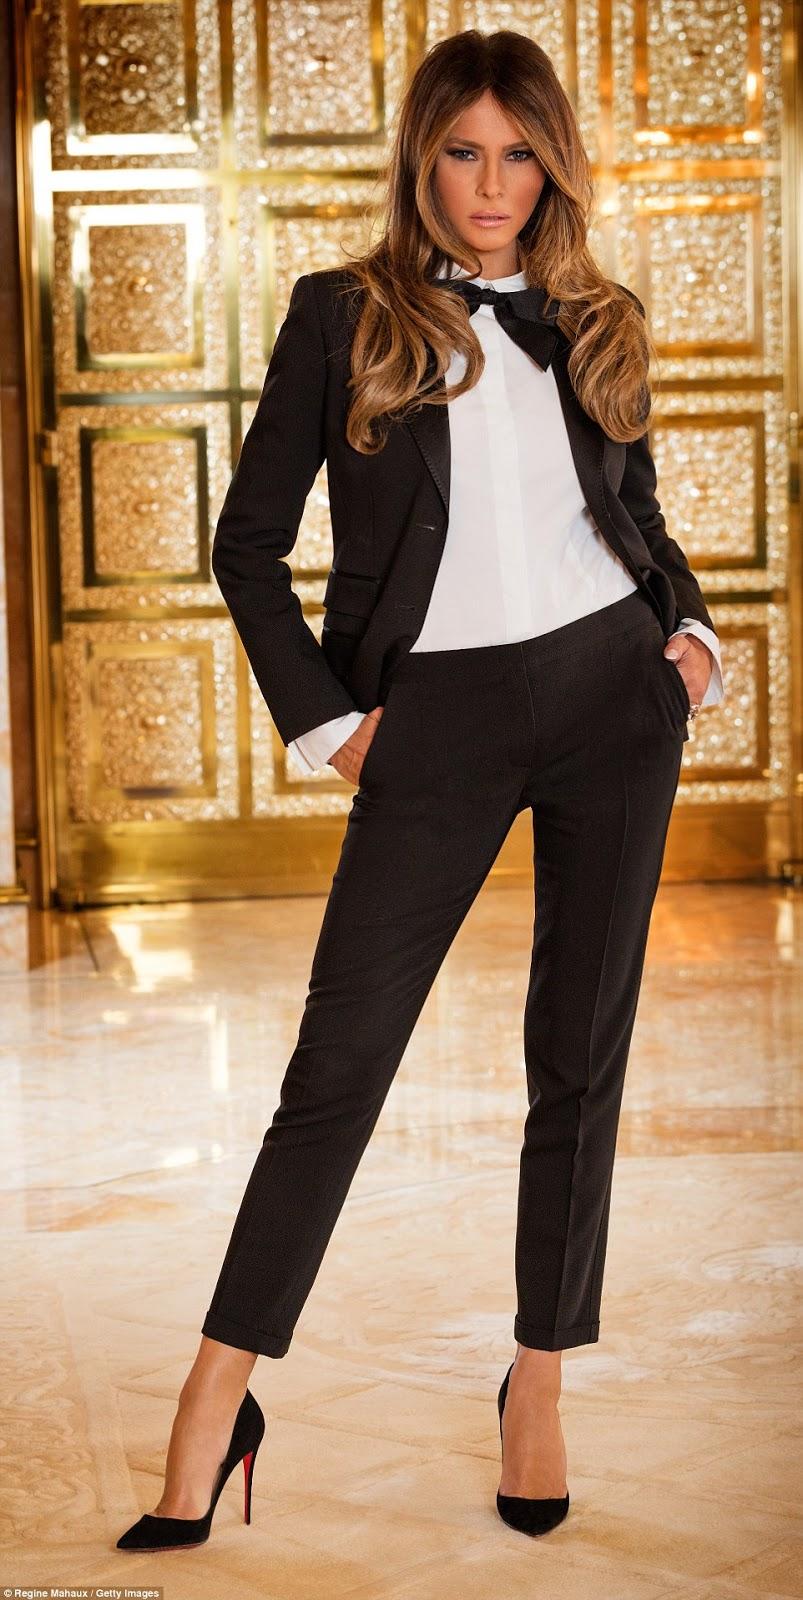 Hot & Sexy US First Lady & Fashion Model Melania Trump Photos - Wife of US President Donald Trump HQ Photos